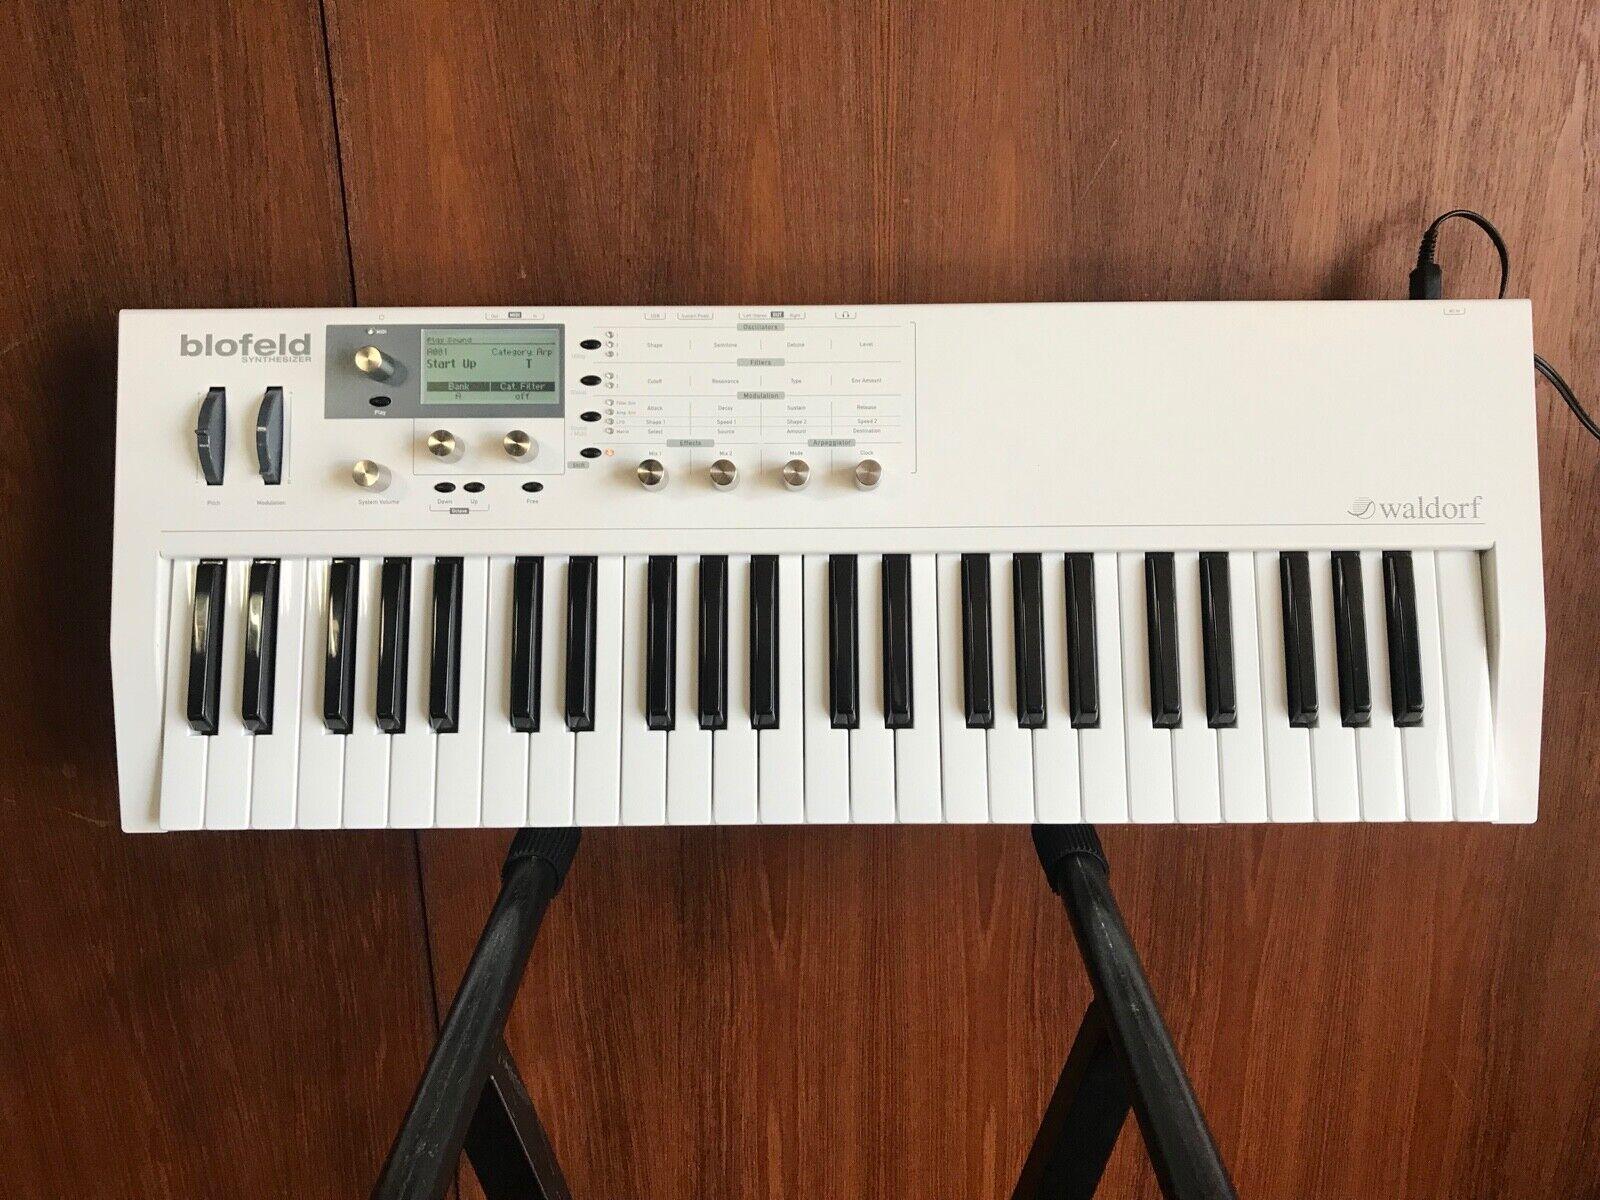 Waldorf Blofeld Keyboard SyntheGrößer Weiß w  box